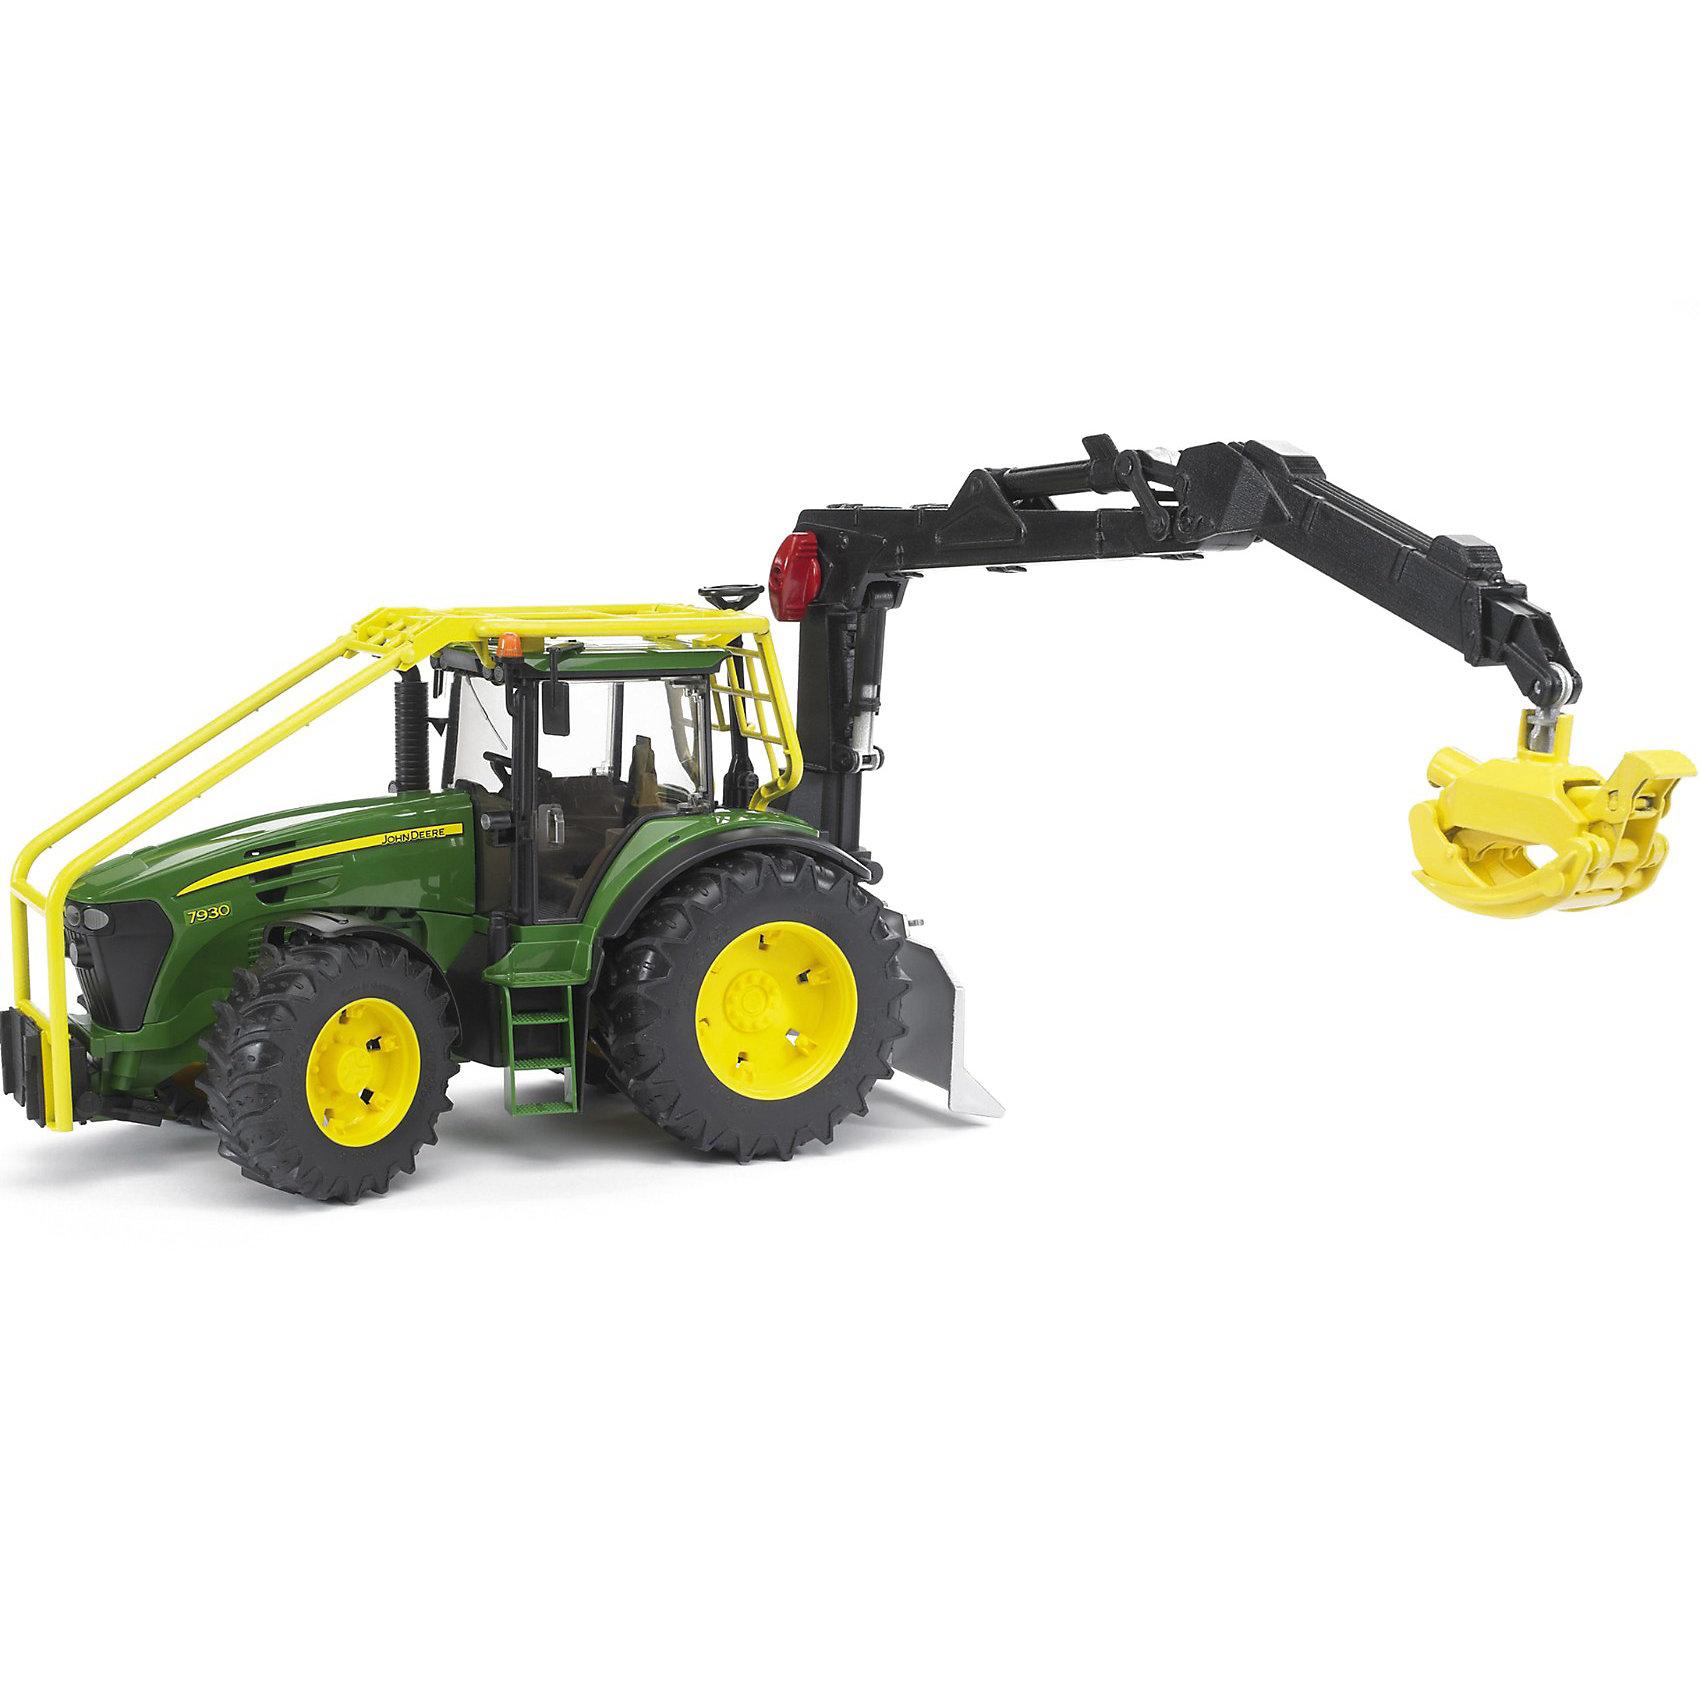 Bruder Трактор John Deere 7930 лесной с манипулятором, Bruder машины bruder трактор john deere 7930 с погрузчиком